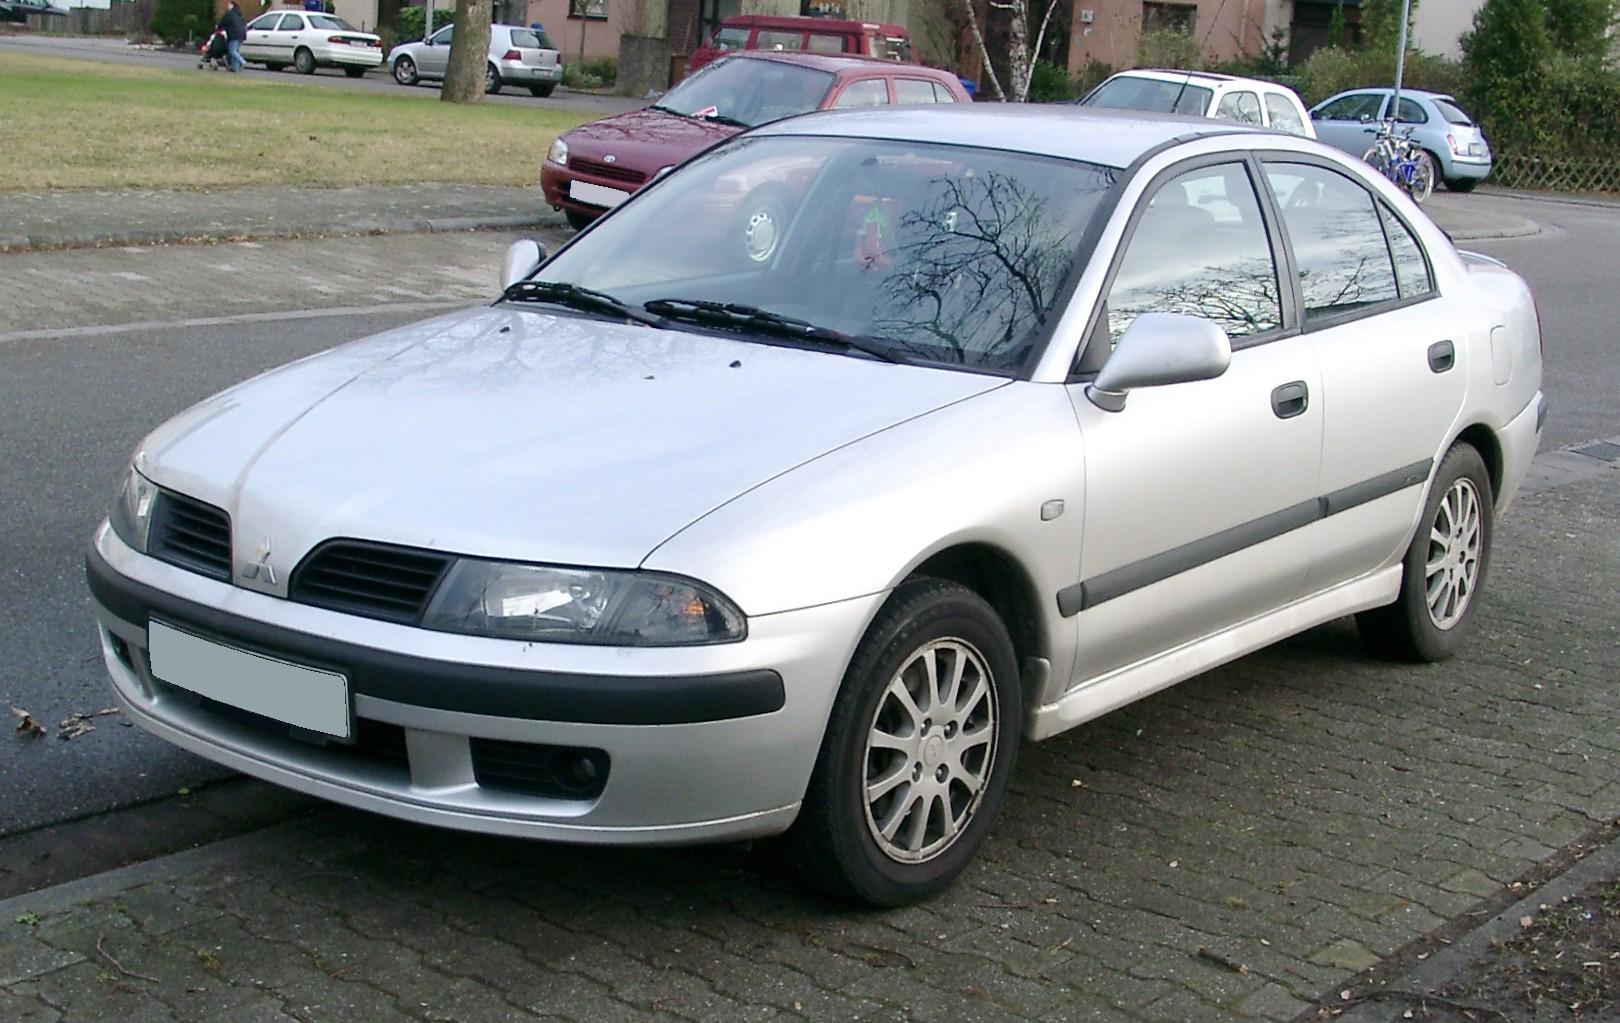 File:Mitsubishi Carisma front 20071205.jpg - Wikipedia